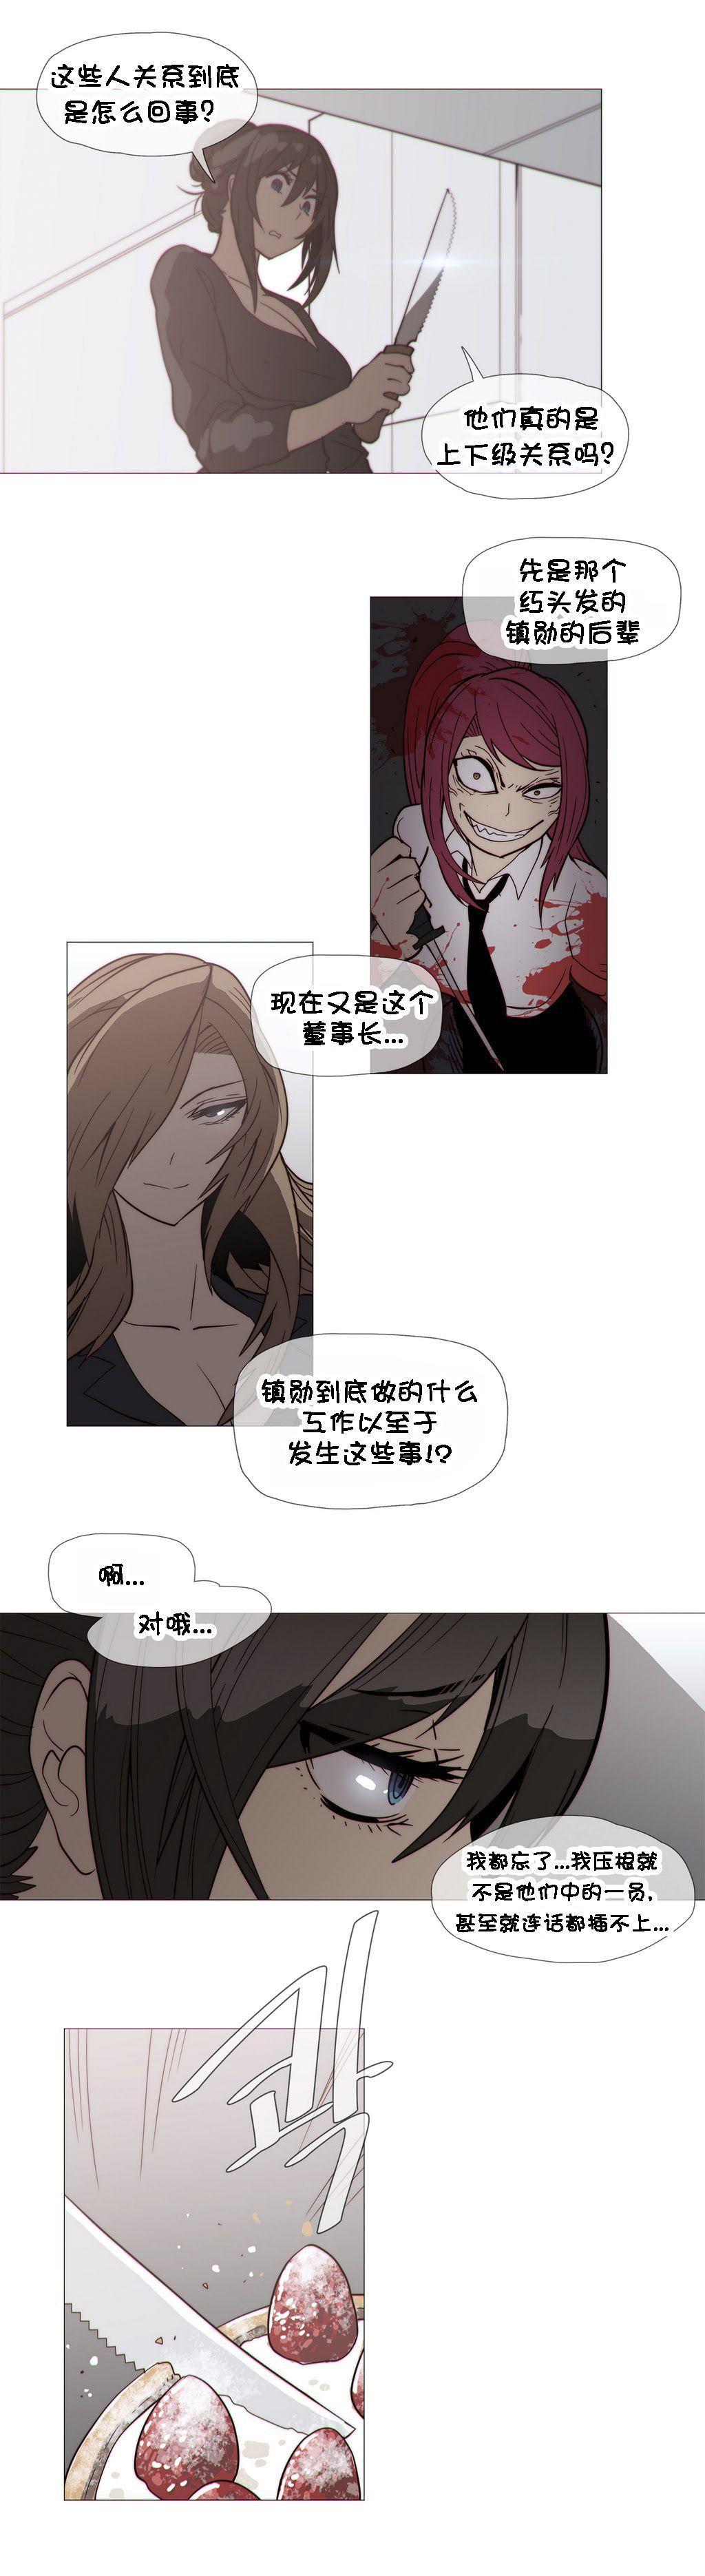 HouseHold Affairs 【卞赤鲤个人汉化】1~33话(持续更新中) 639